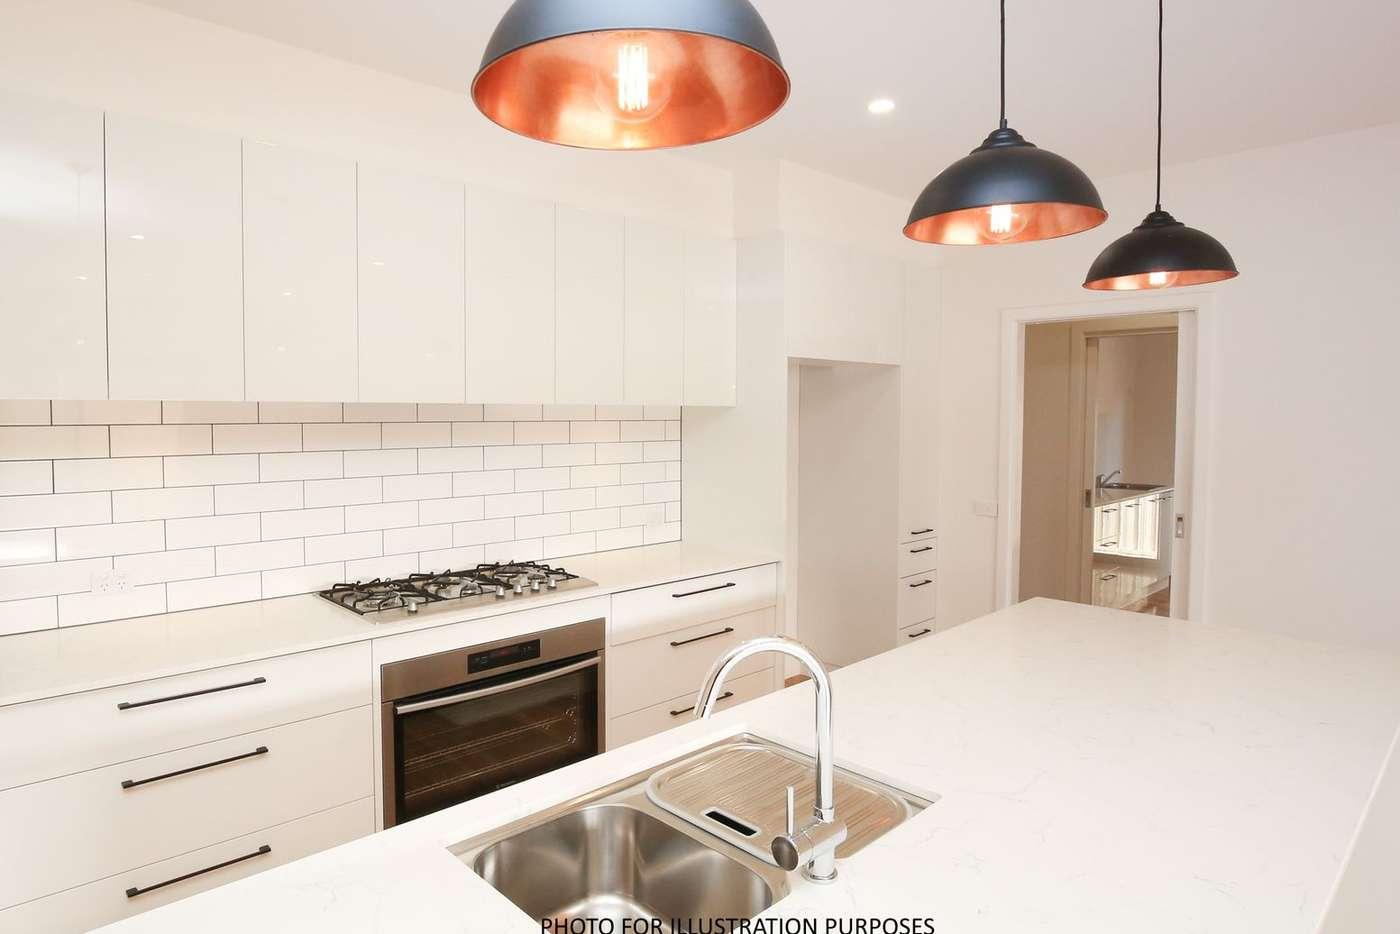 Fifth view of Homely house listing, 8 Limpidi Drive, Mildura VIC 3500